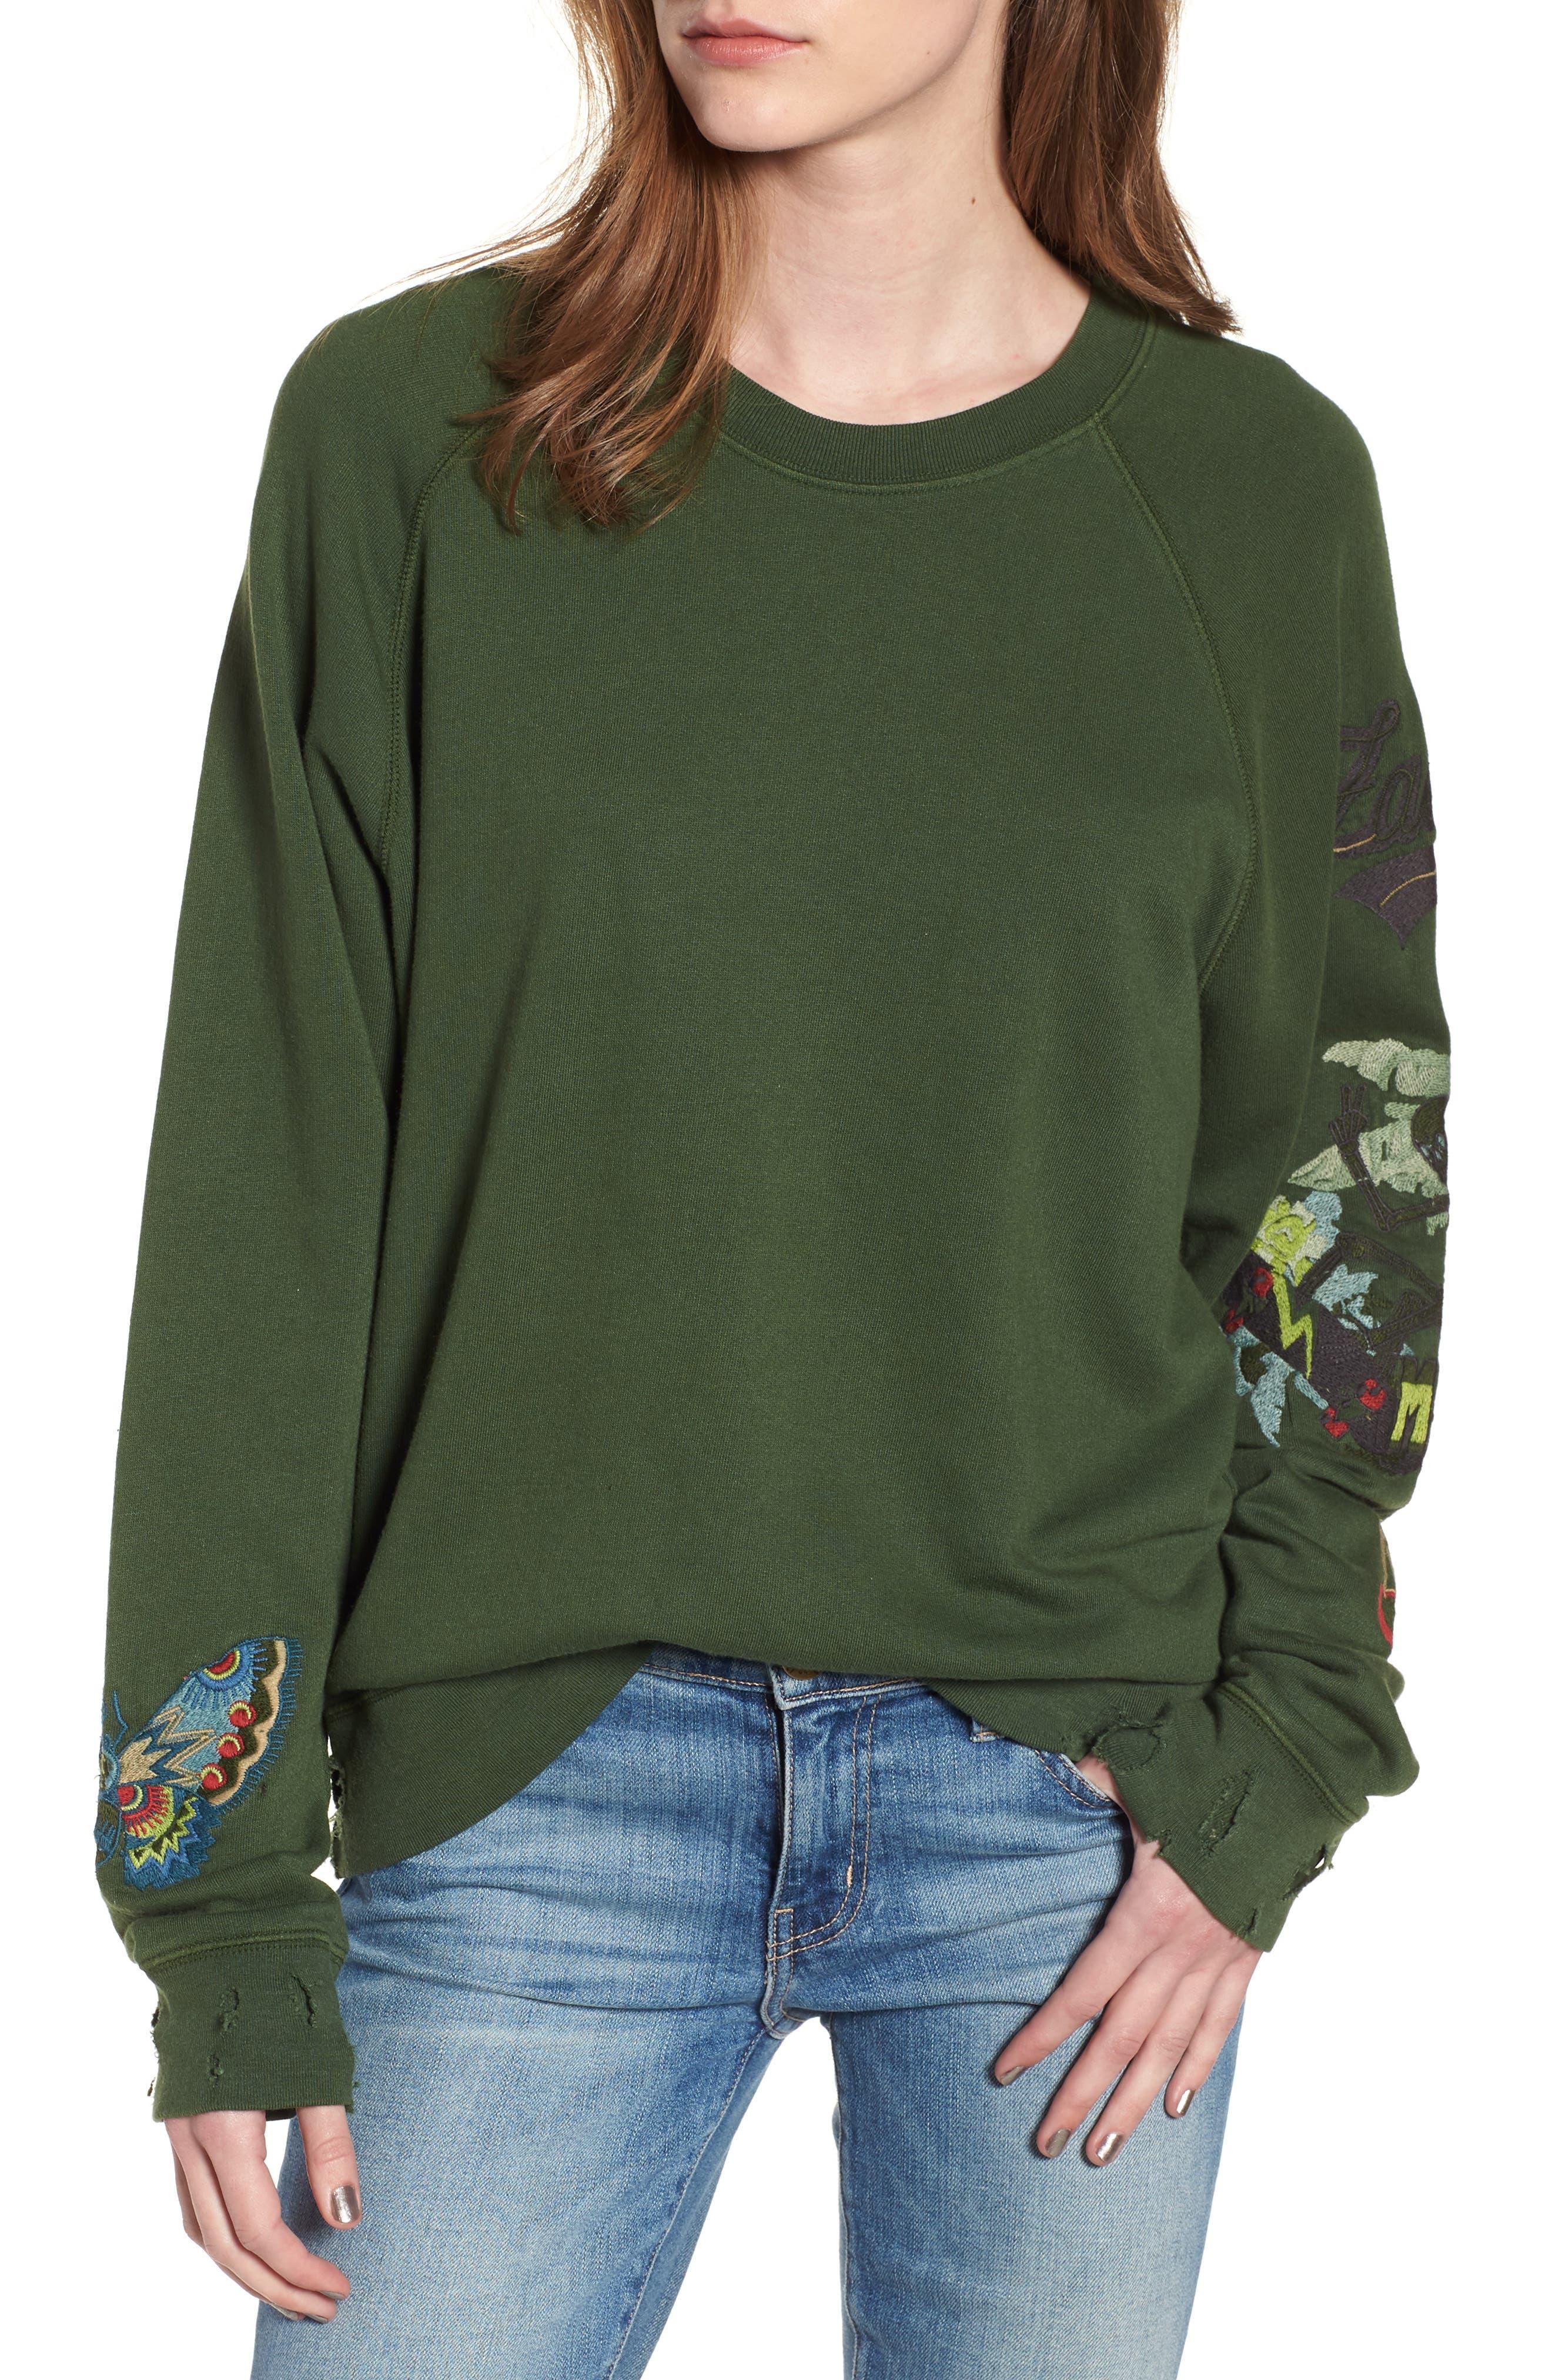 Upper Bis Brode Sweatshirt,                             Main thumbnail 1, color,                             Tropical